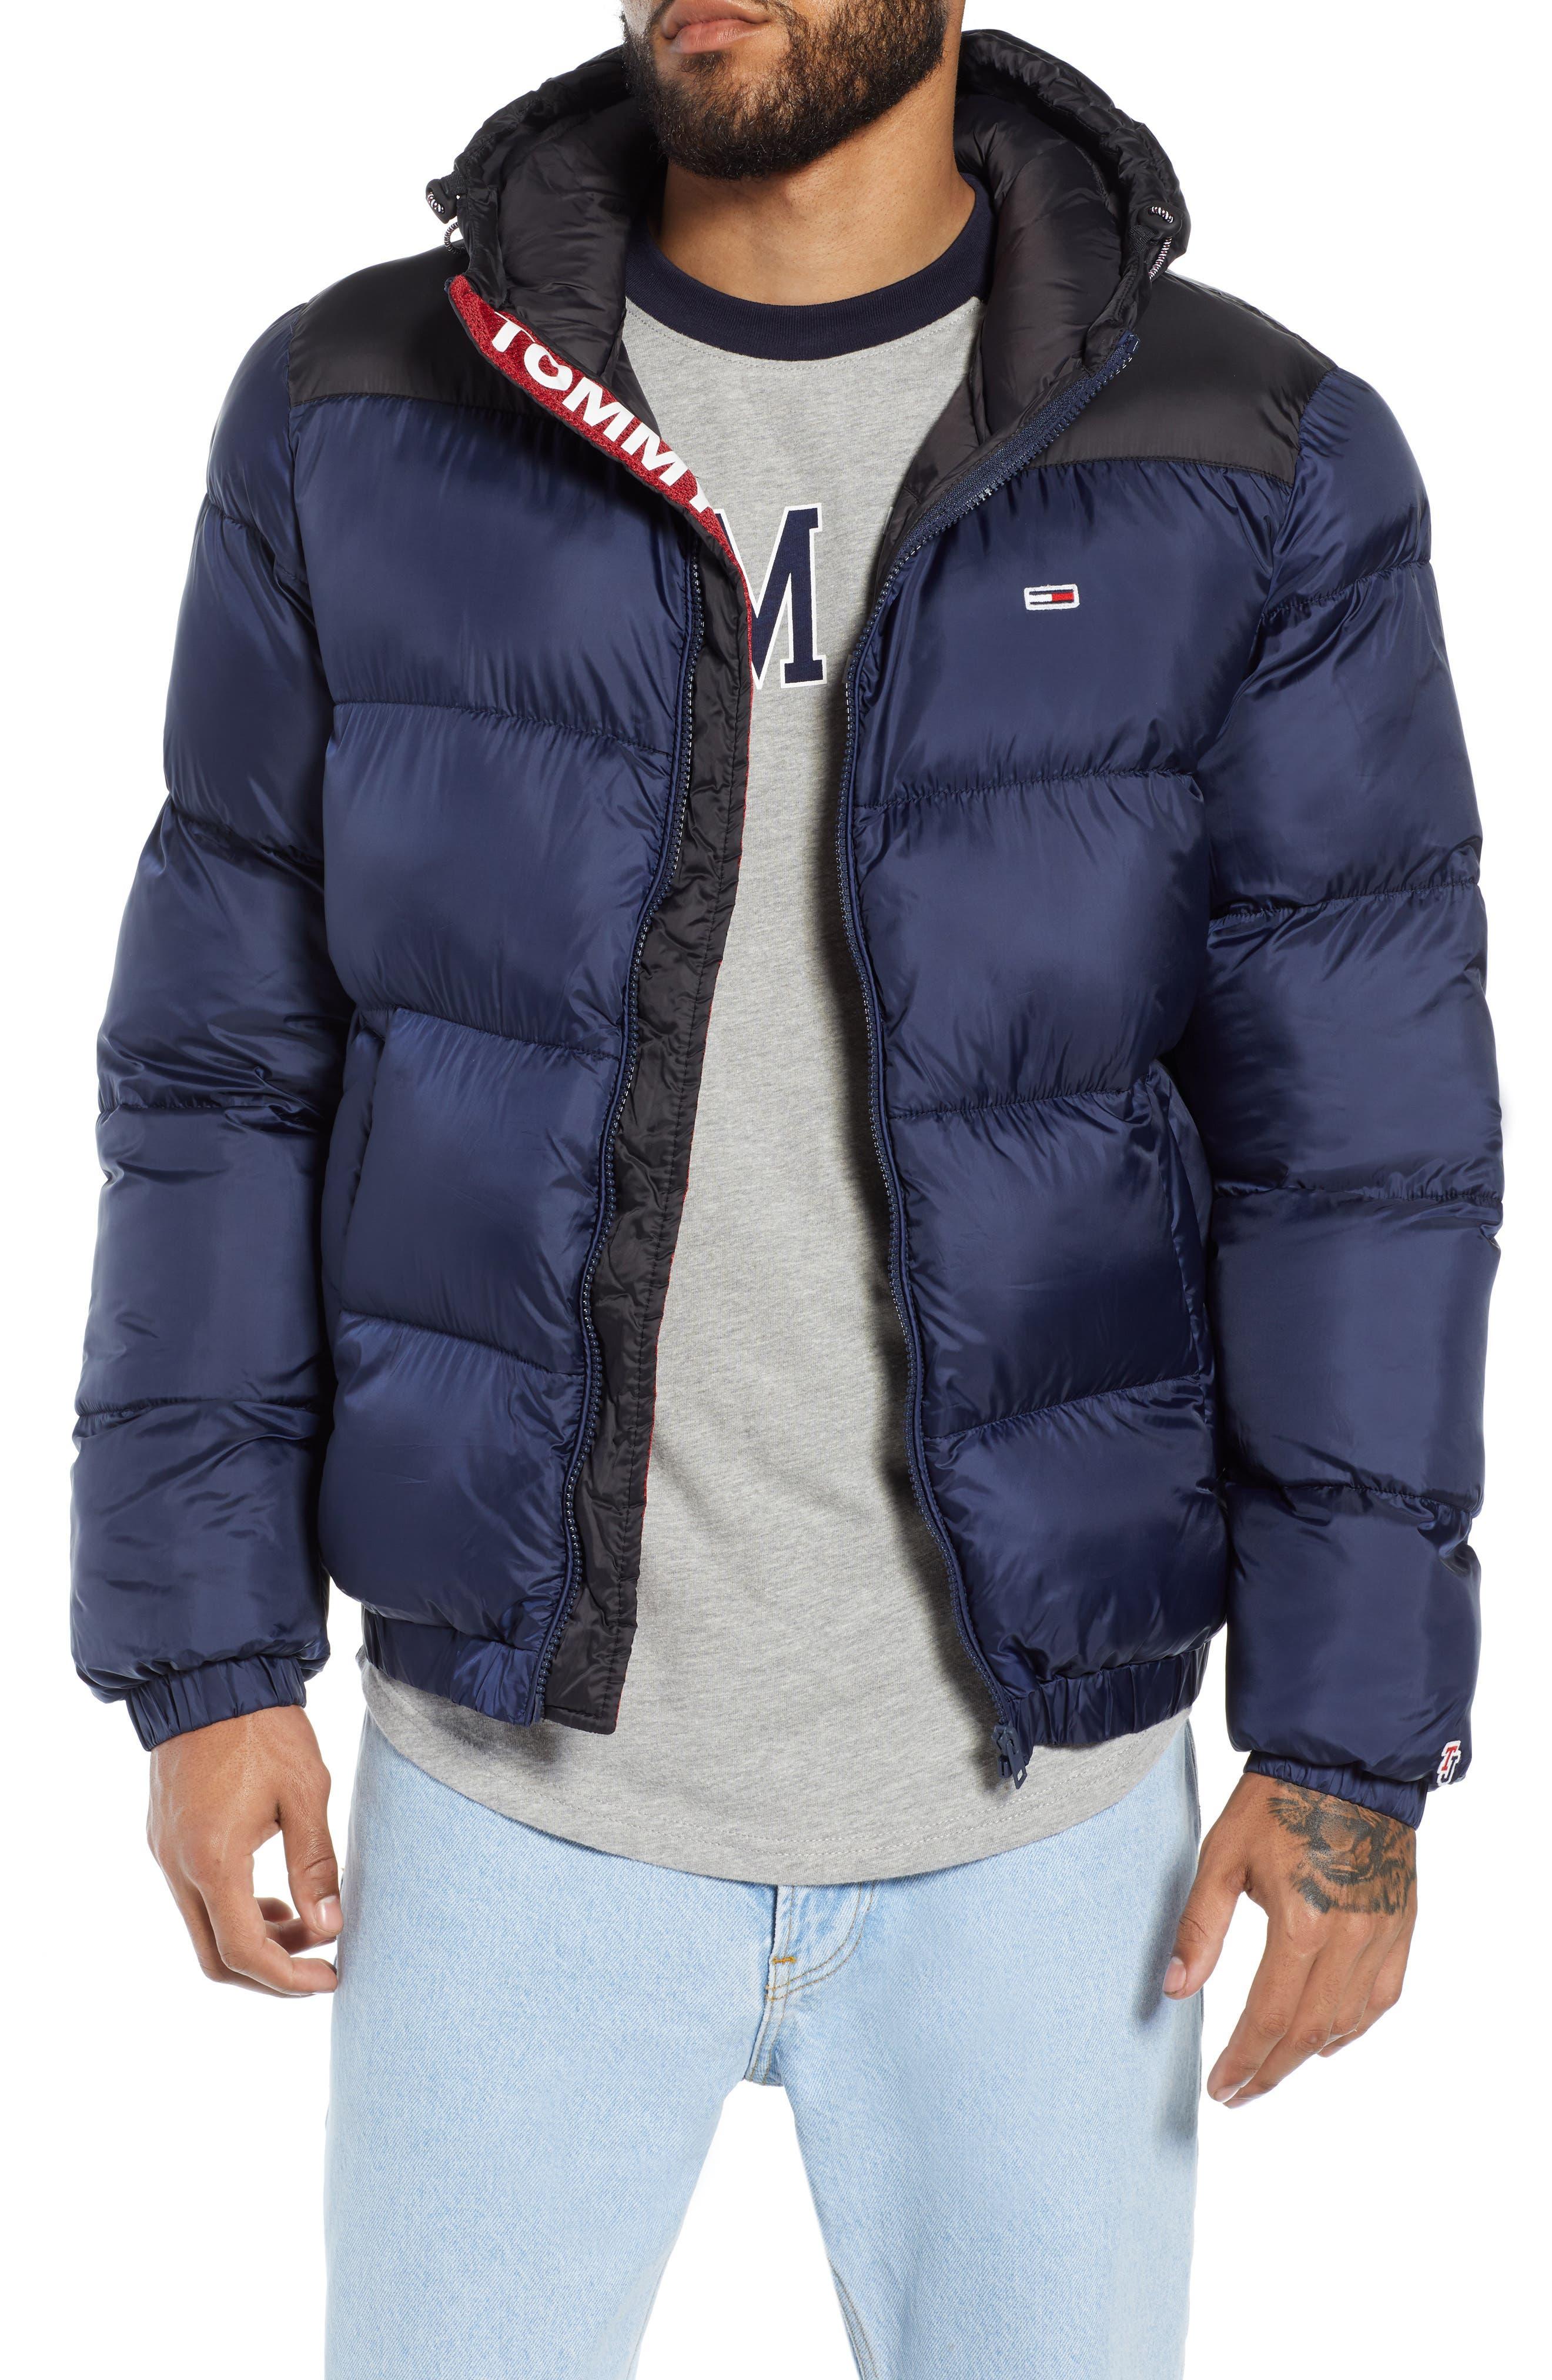 Classics Hooded Jacket,                         Main,                         color, BLACK IRIS / TOMMY BLACK